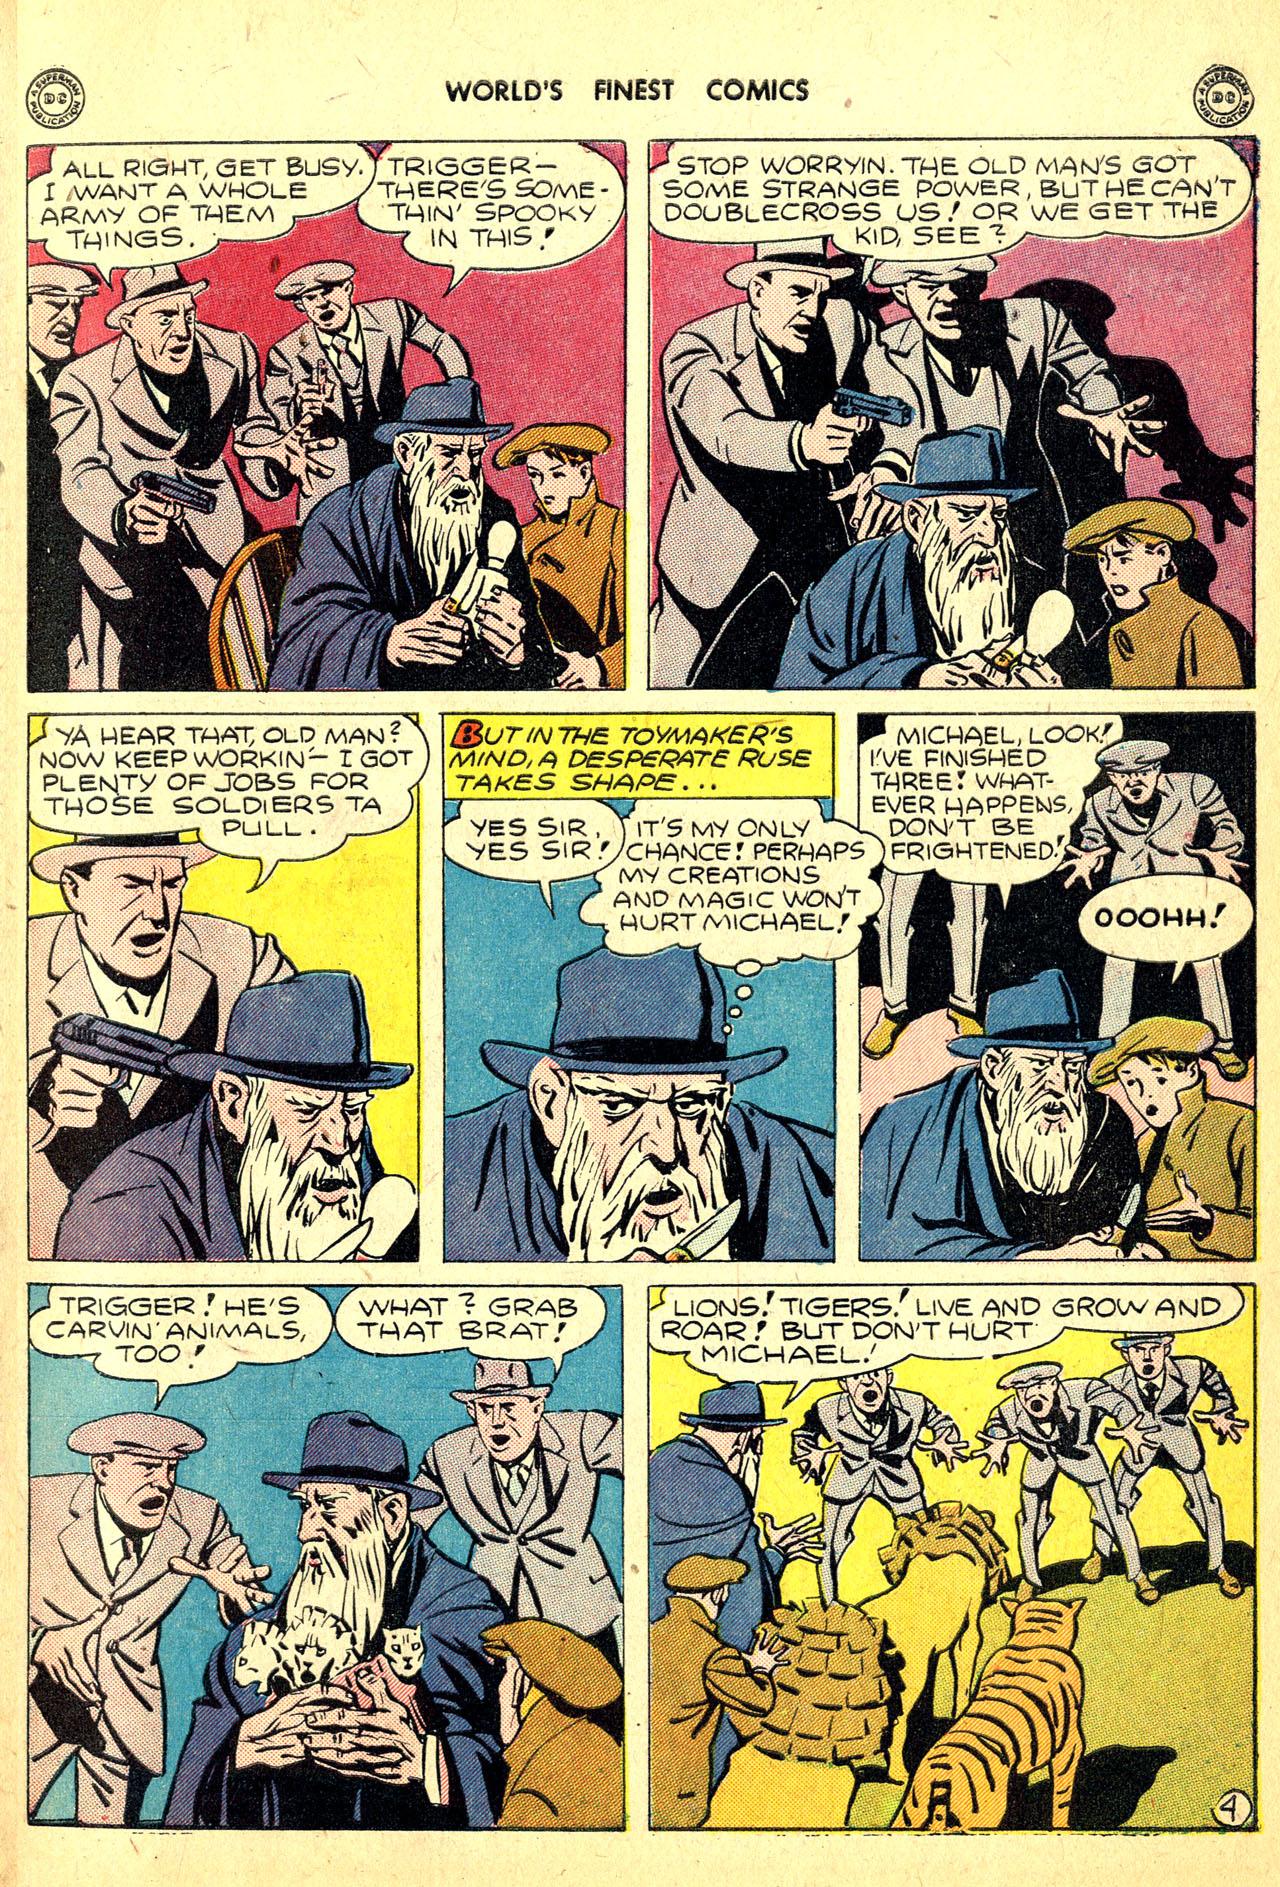 Read online World's Finest Comics comic -  Issue #18 - 29